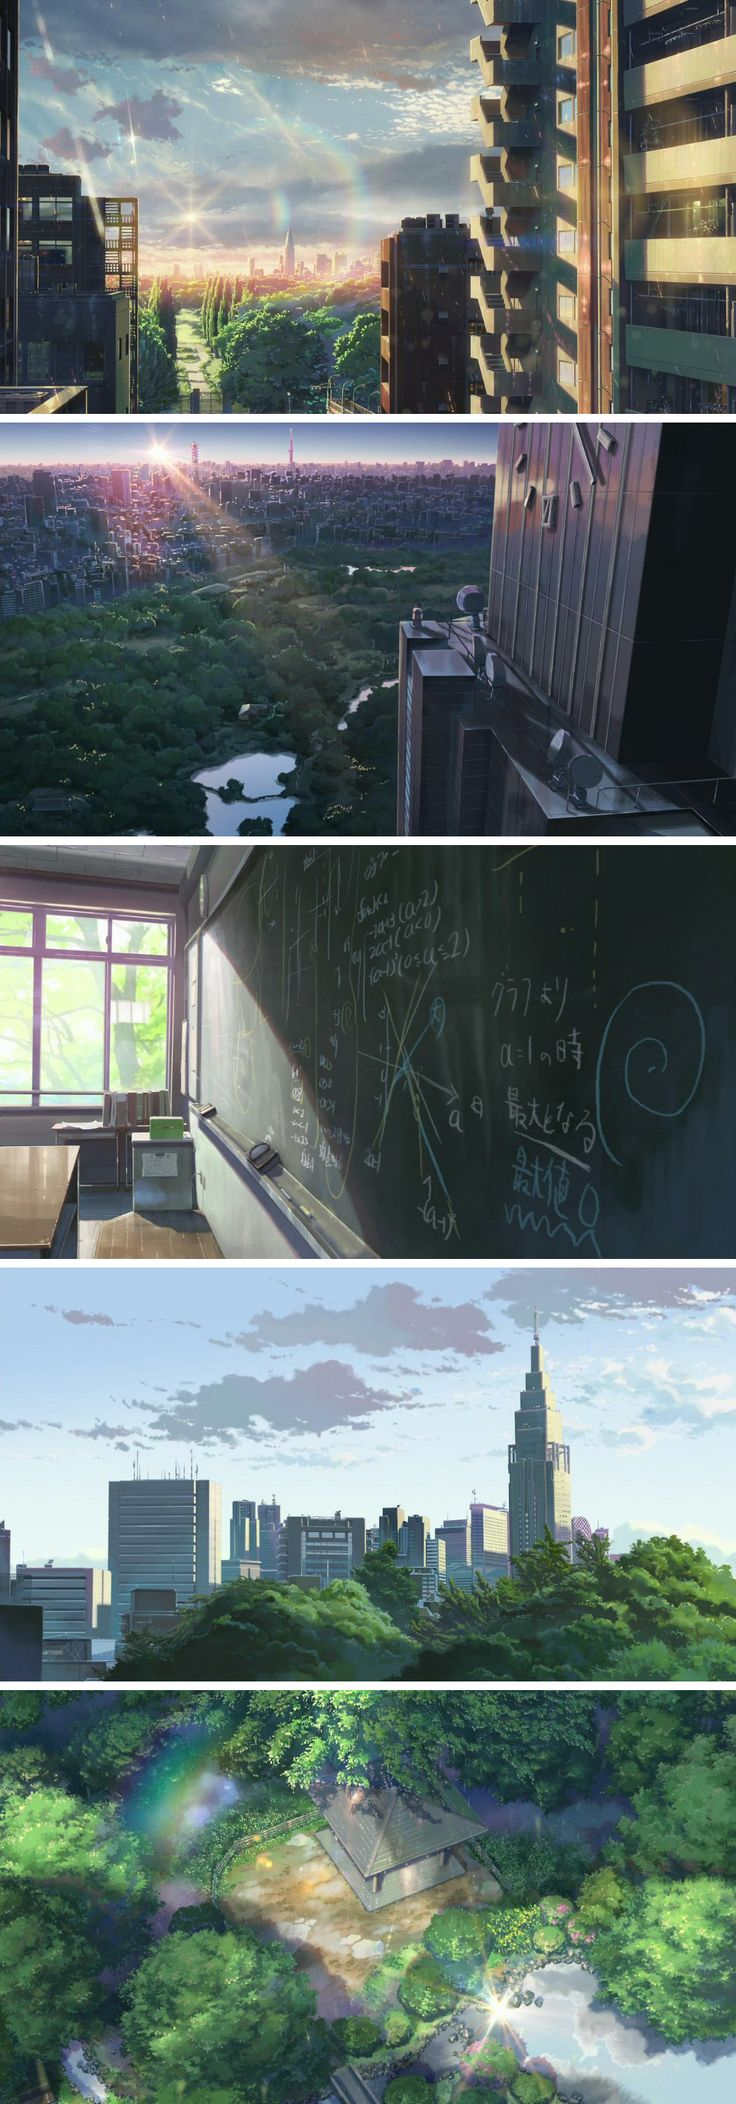 Best 25 Anime Films Ideas On Pinterest